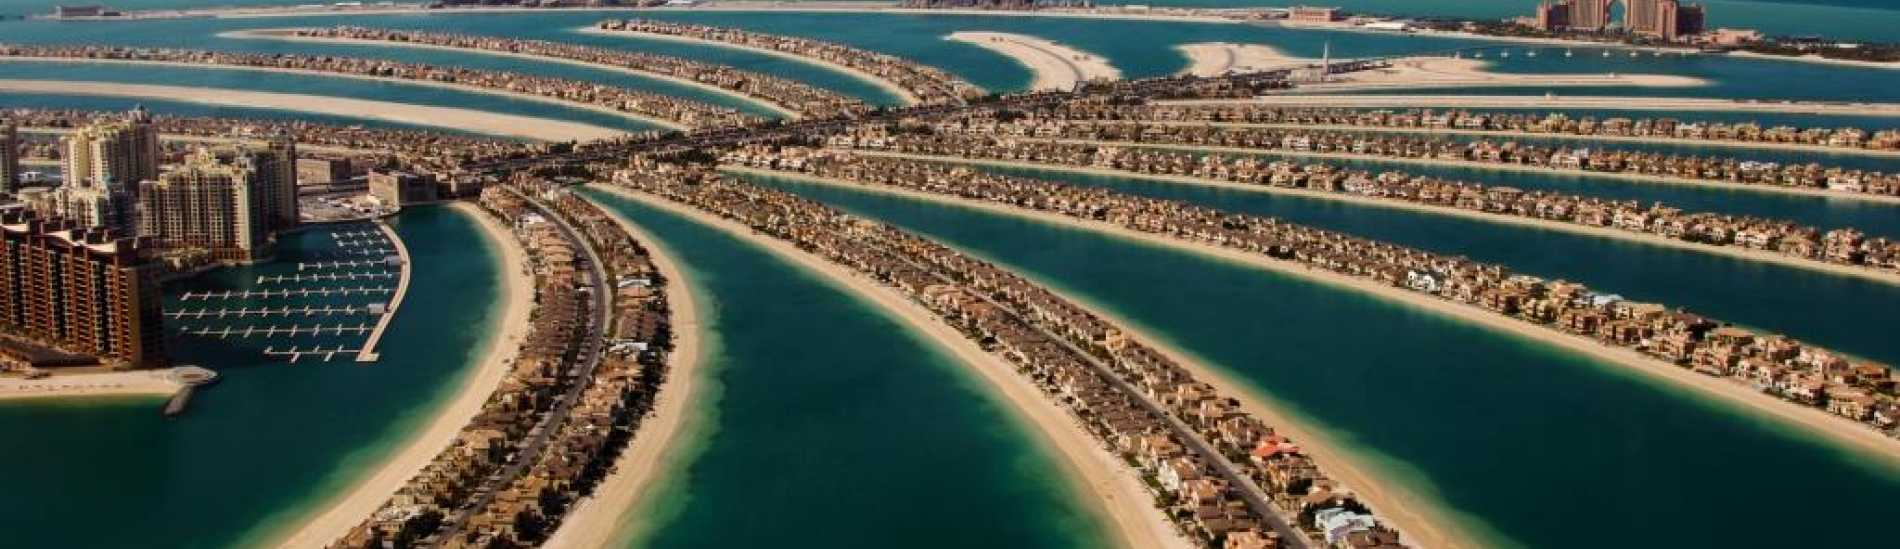 Haute Residence: Andrew Cummings Showcases Palm Jumeirah Dubai's Man Made Marvel